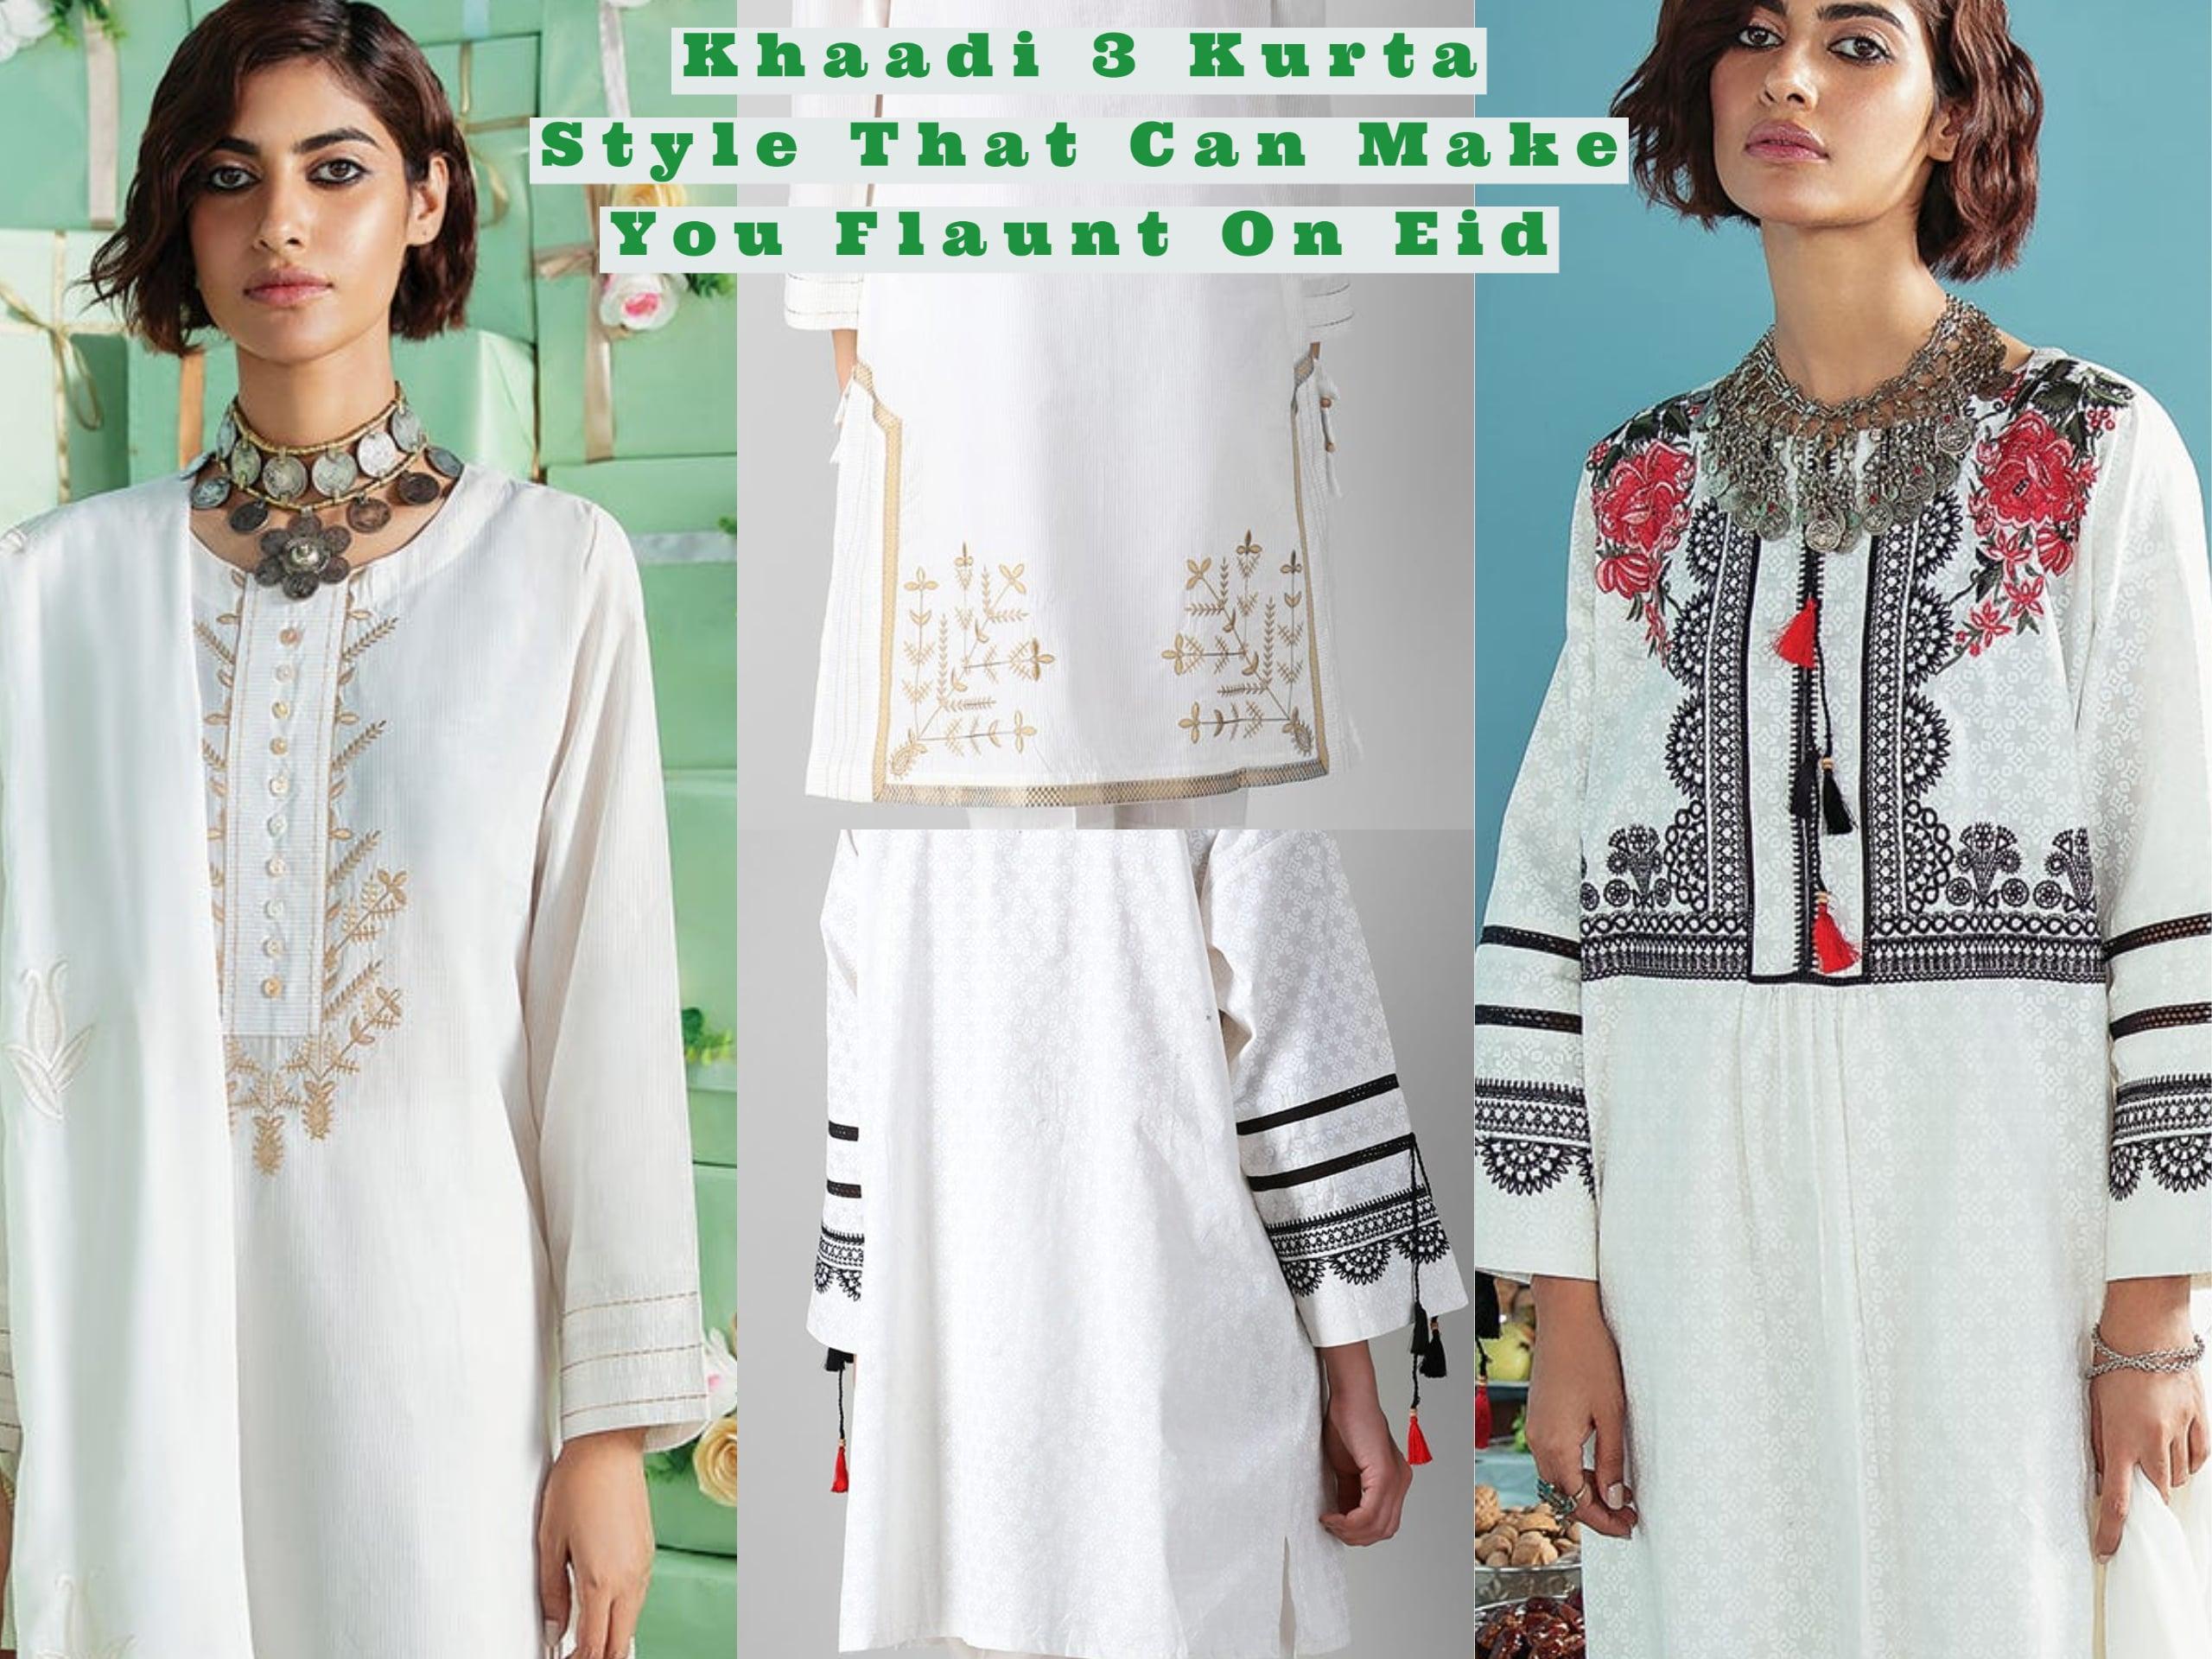 Khaadi 3 Kurta Style That Can Make You Flaunt On Eid